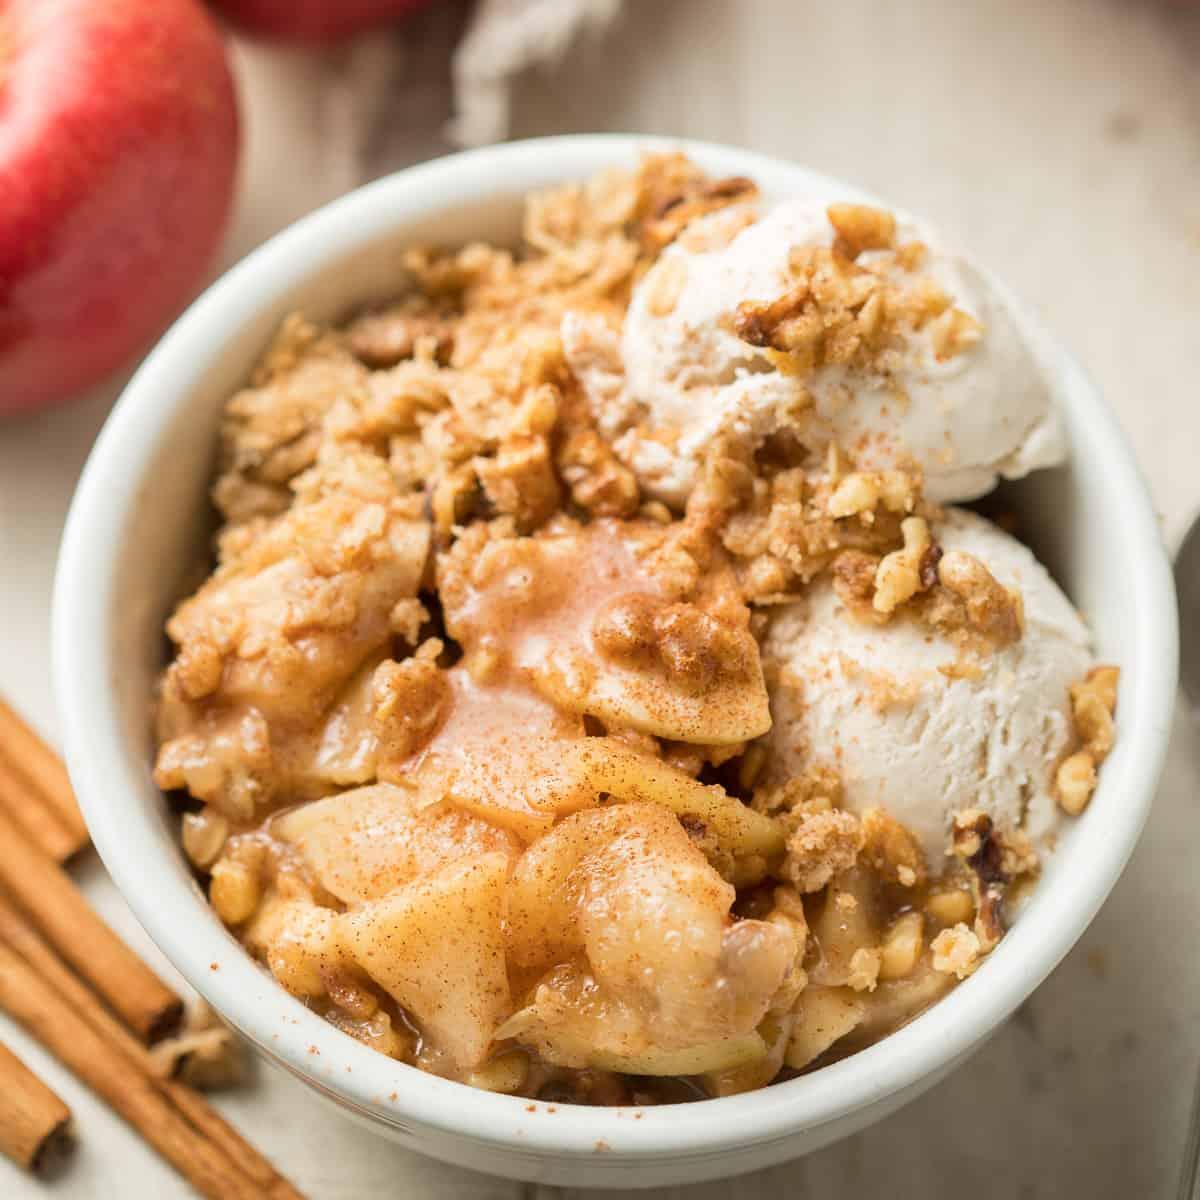 Bowl of Vegan Apple Crisp with Two Scoops of Ice Cream